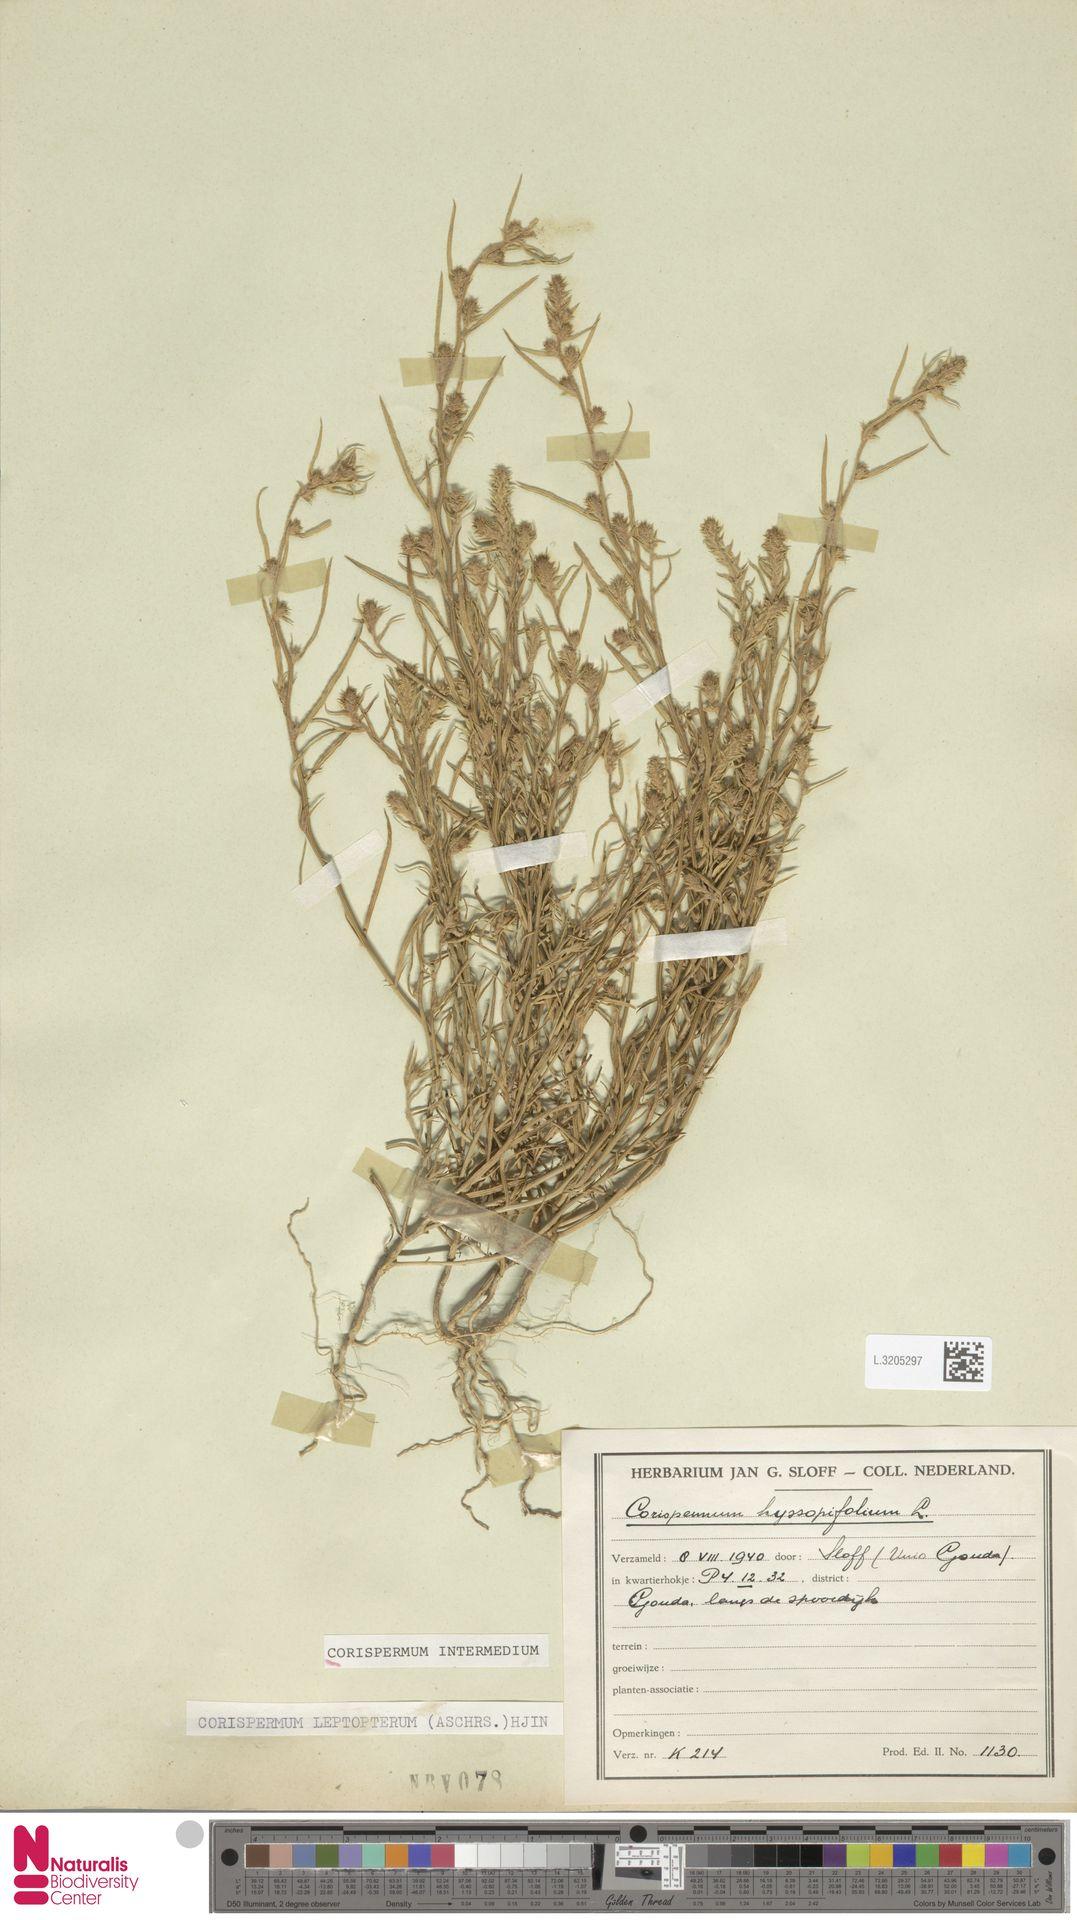 L.3205297 | Corispermum intermedium Schweigg.